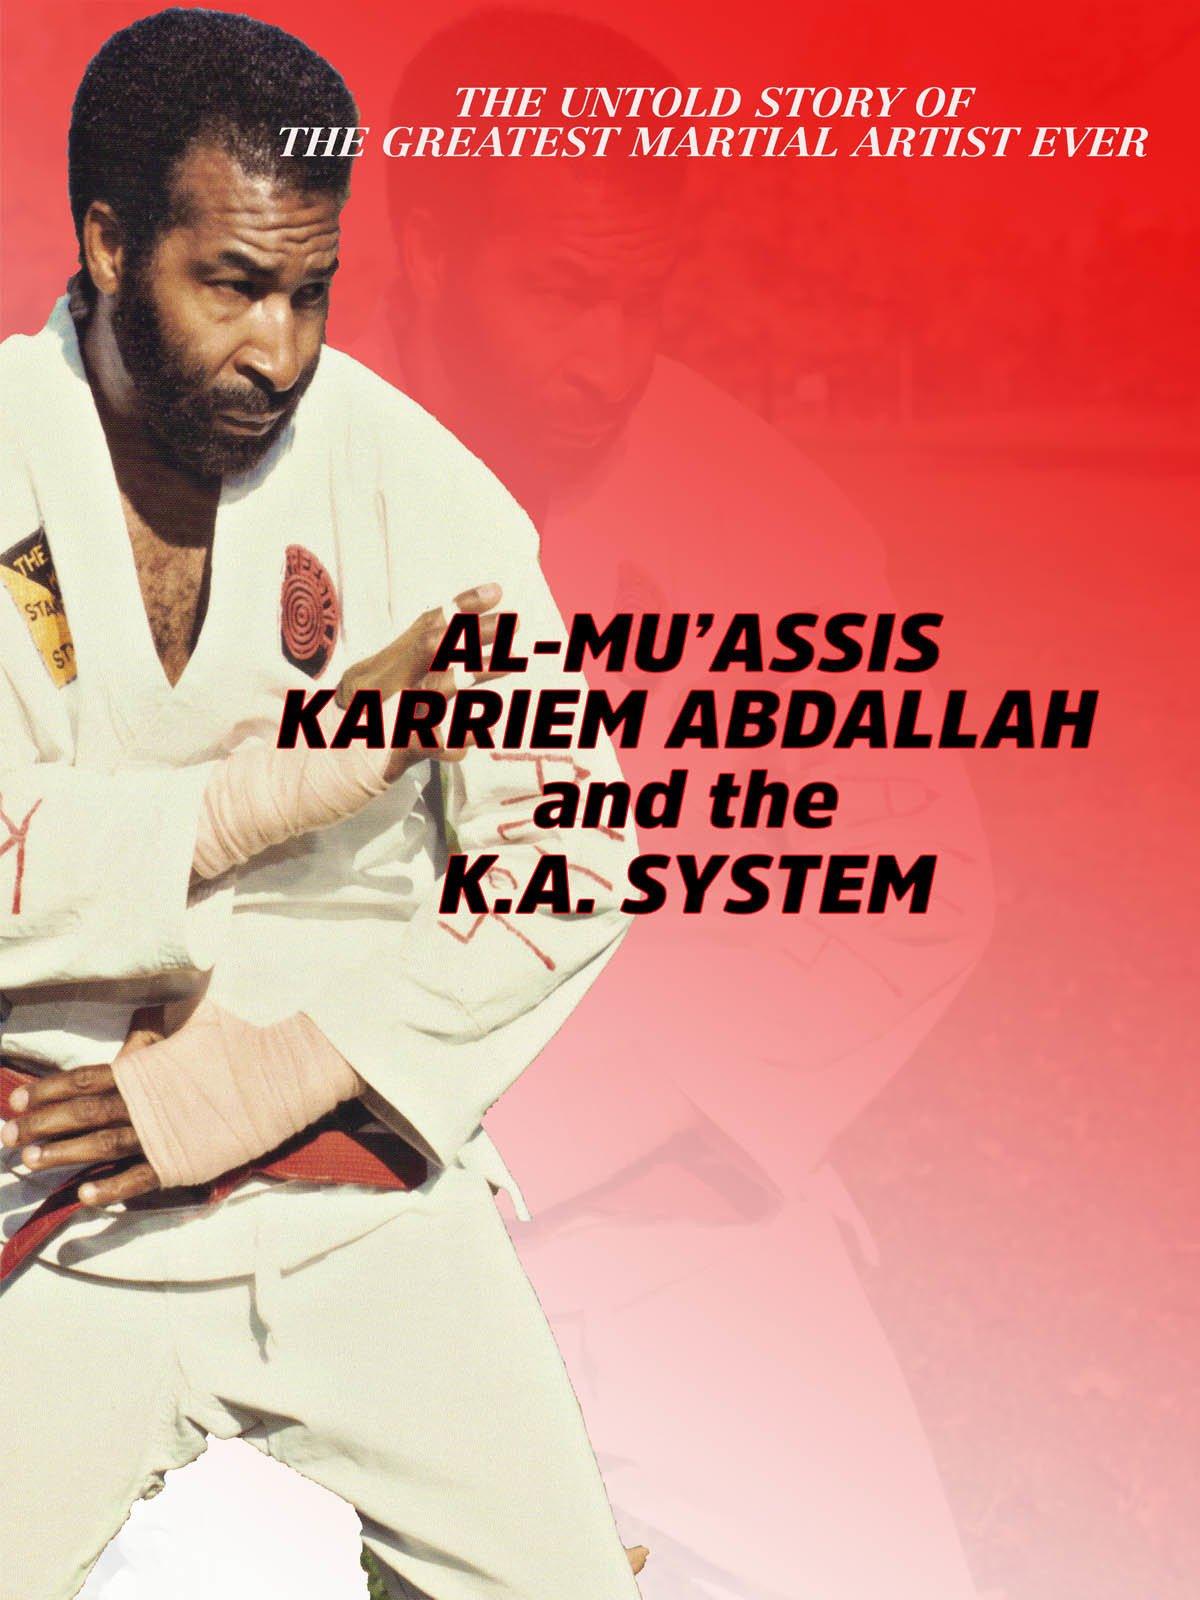 Karriem AbDallah and the KA System